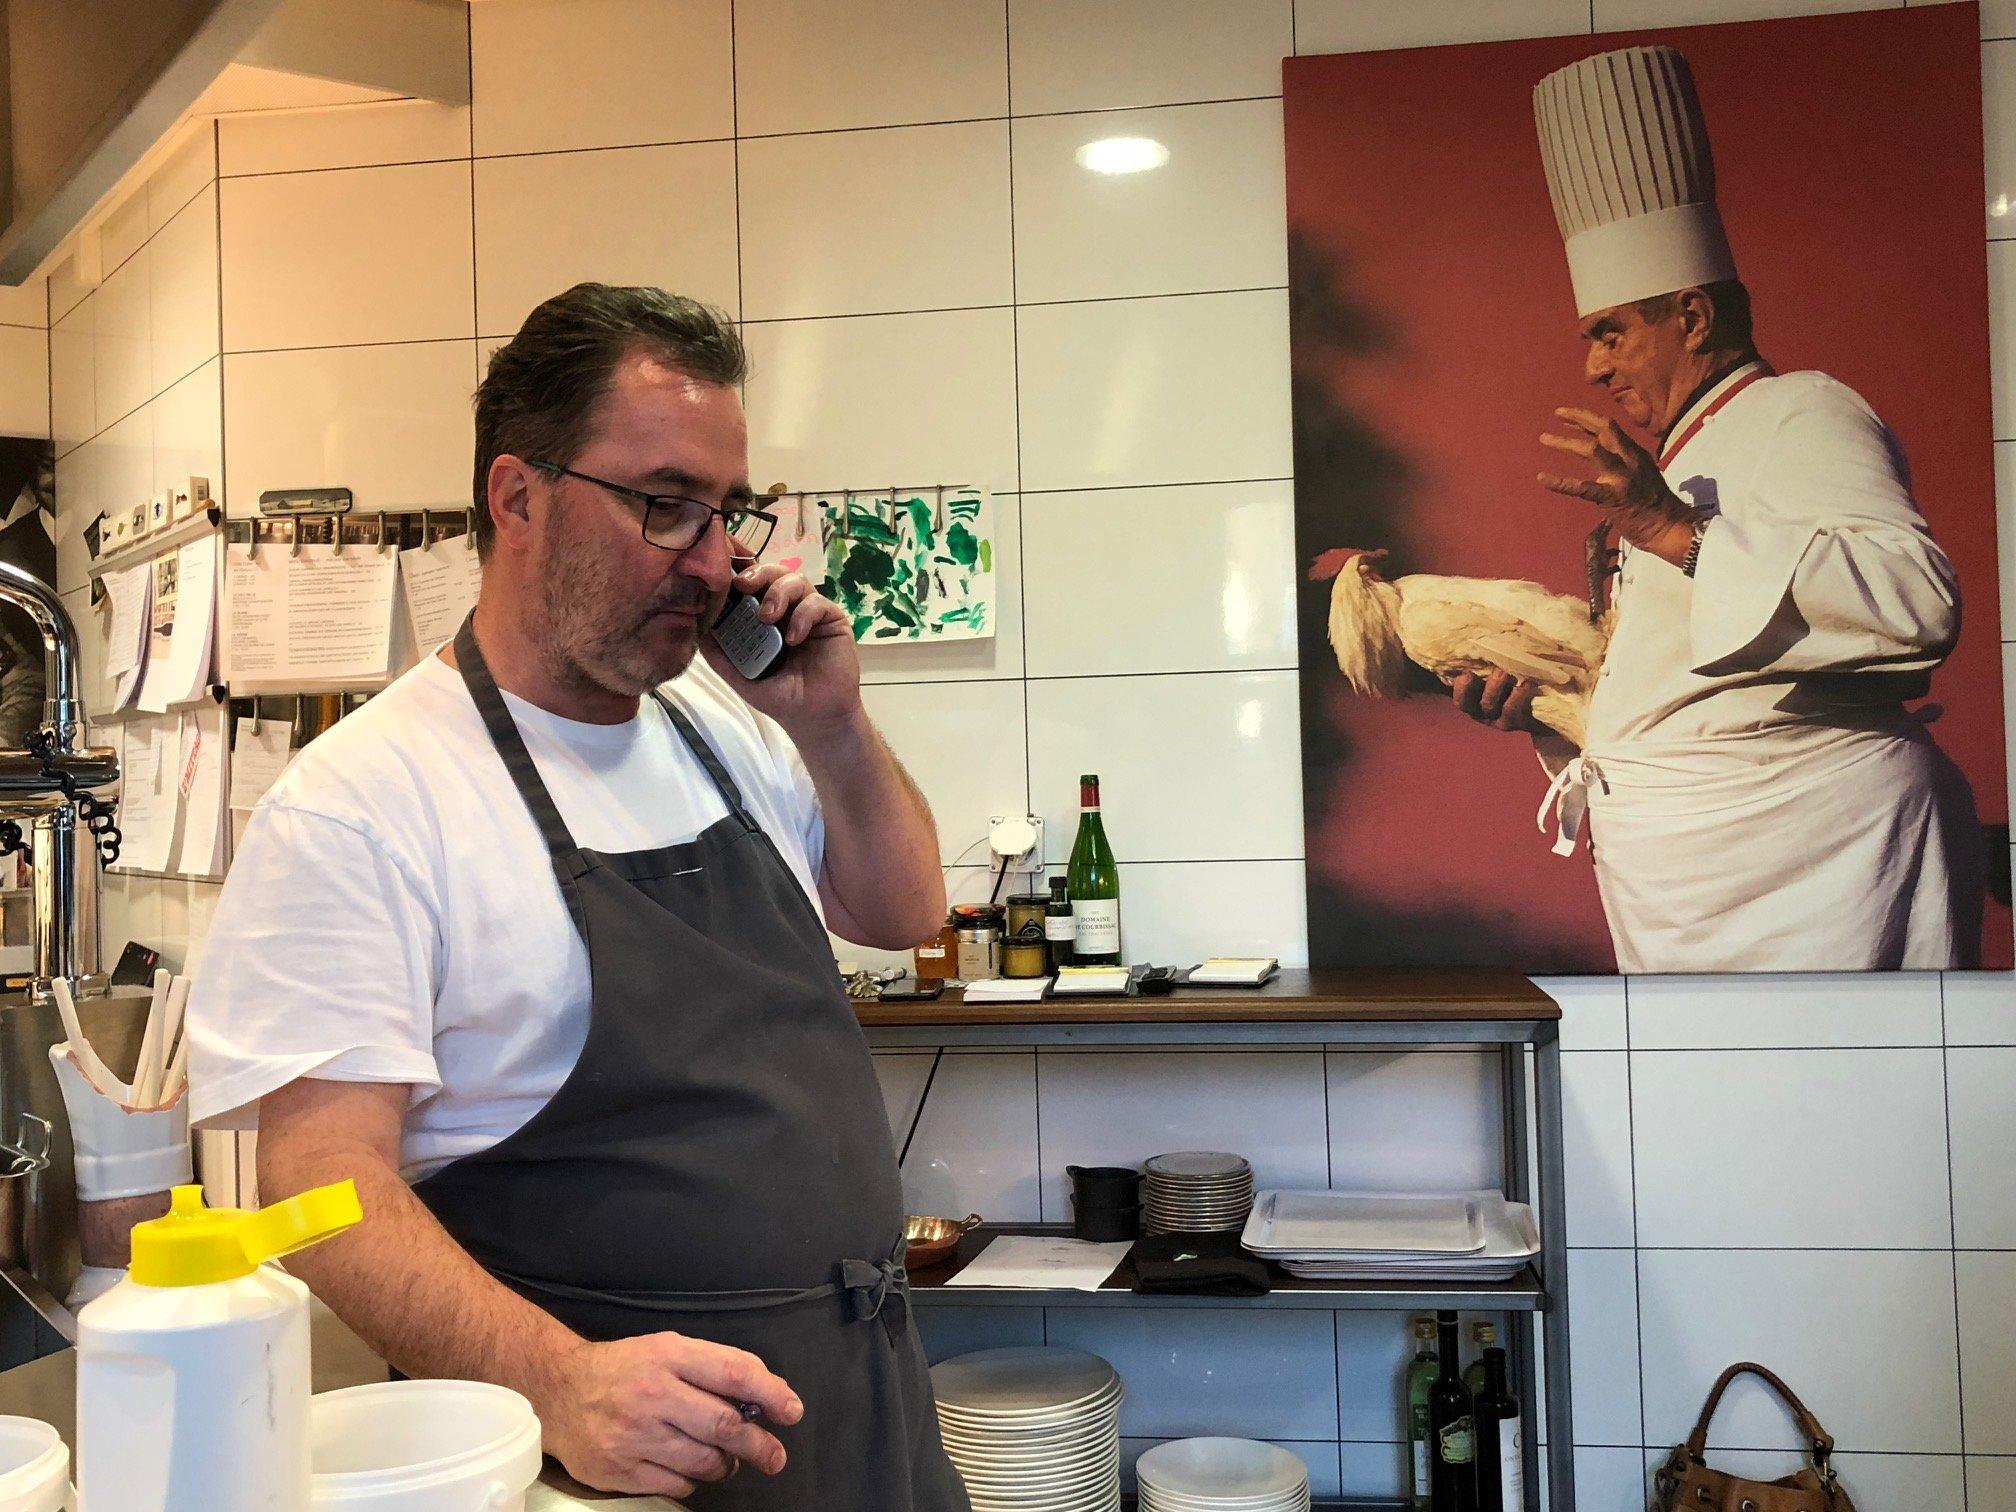 Über allem wacht der Kochgott: Bocuse liefert Tobler auch Ideen wie seine berühmte Zwiebelsuppe.